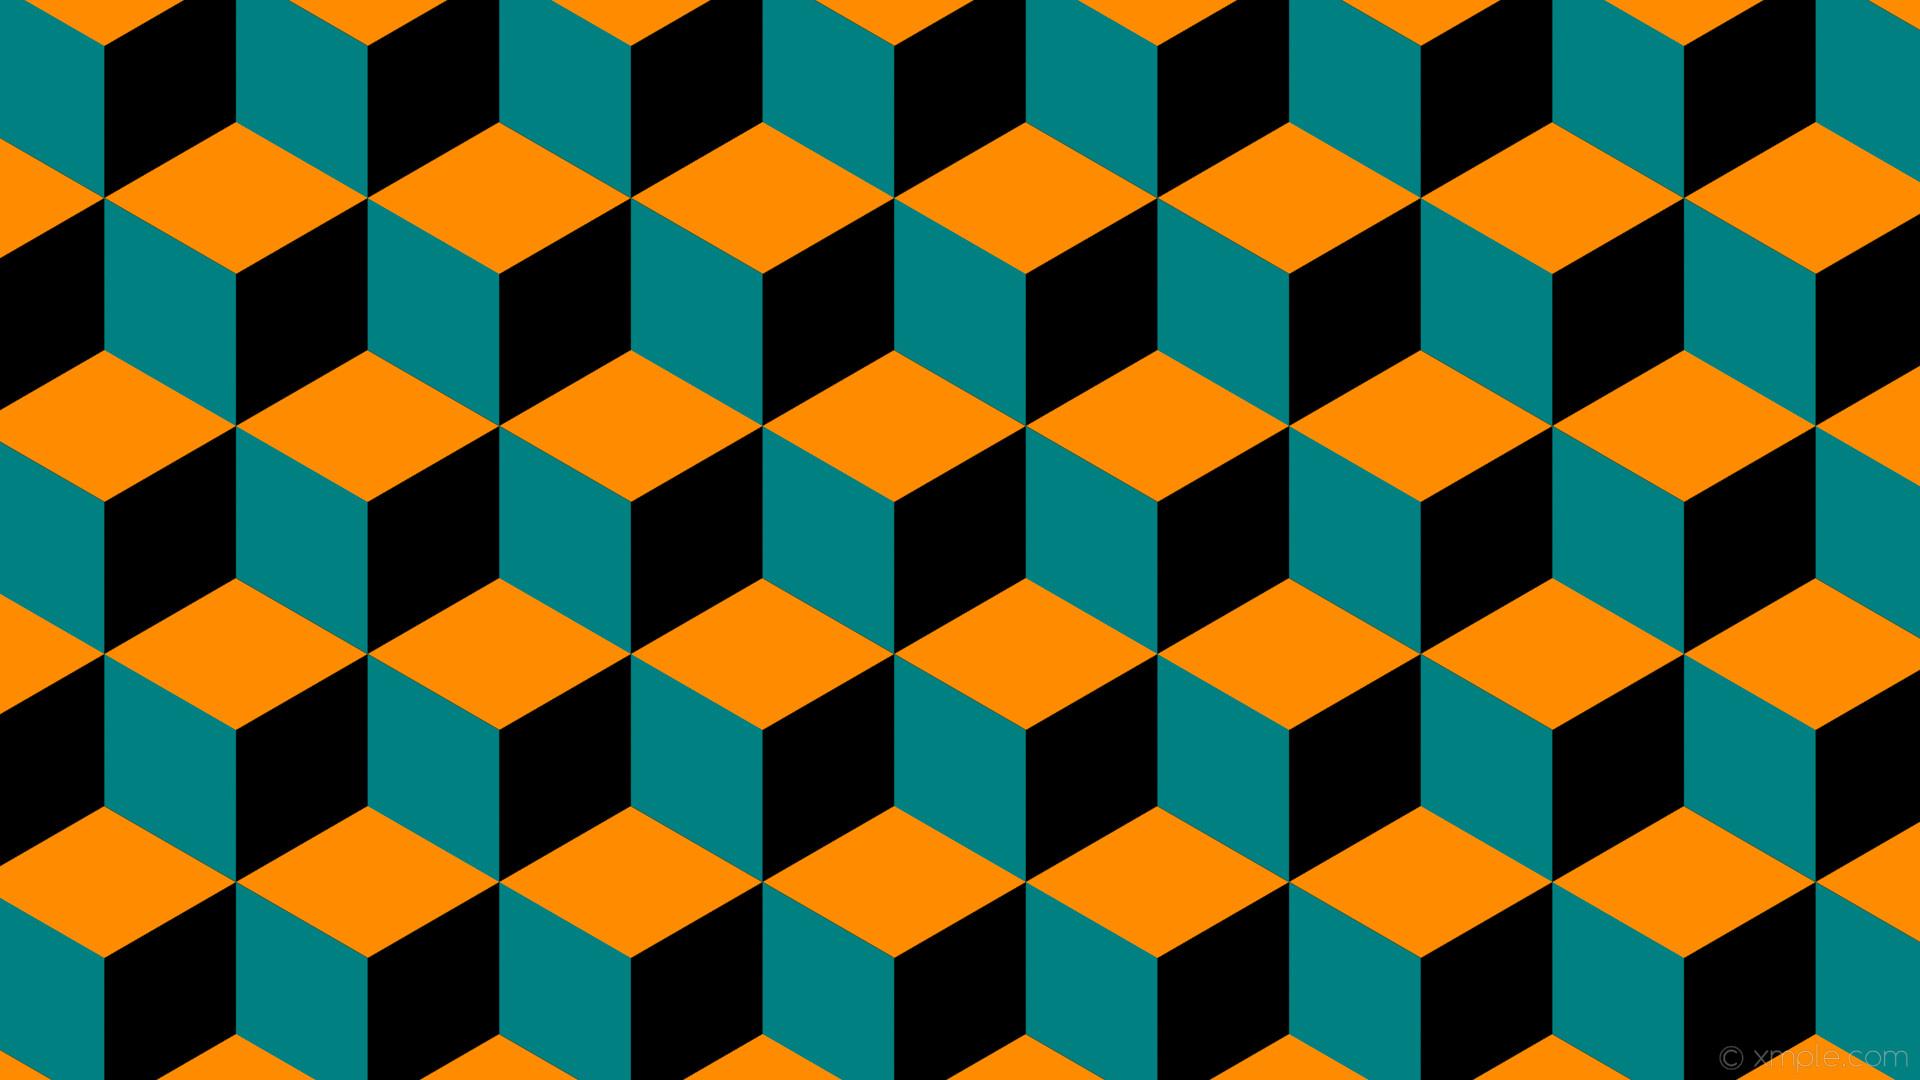 wallpaper green orange 3d cubes black dark orange teal #000000 #ff8c00  #008080 240